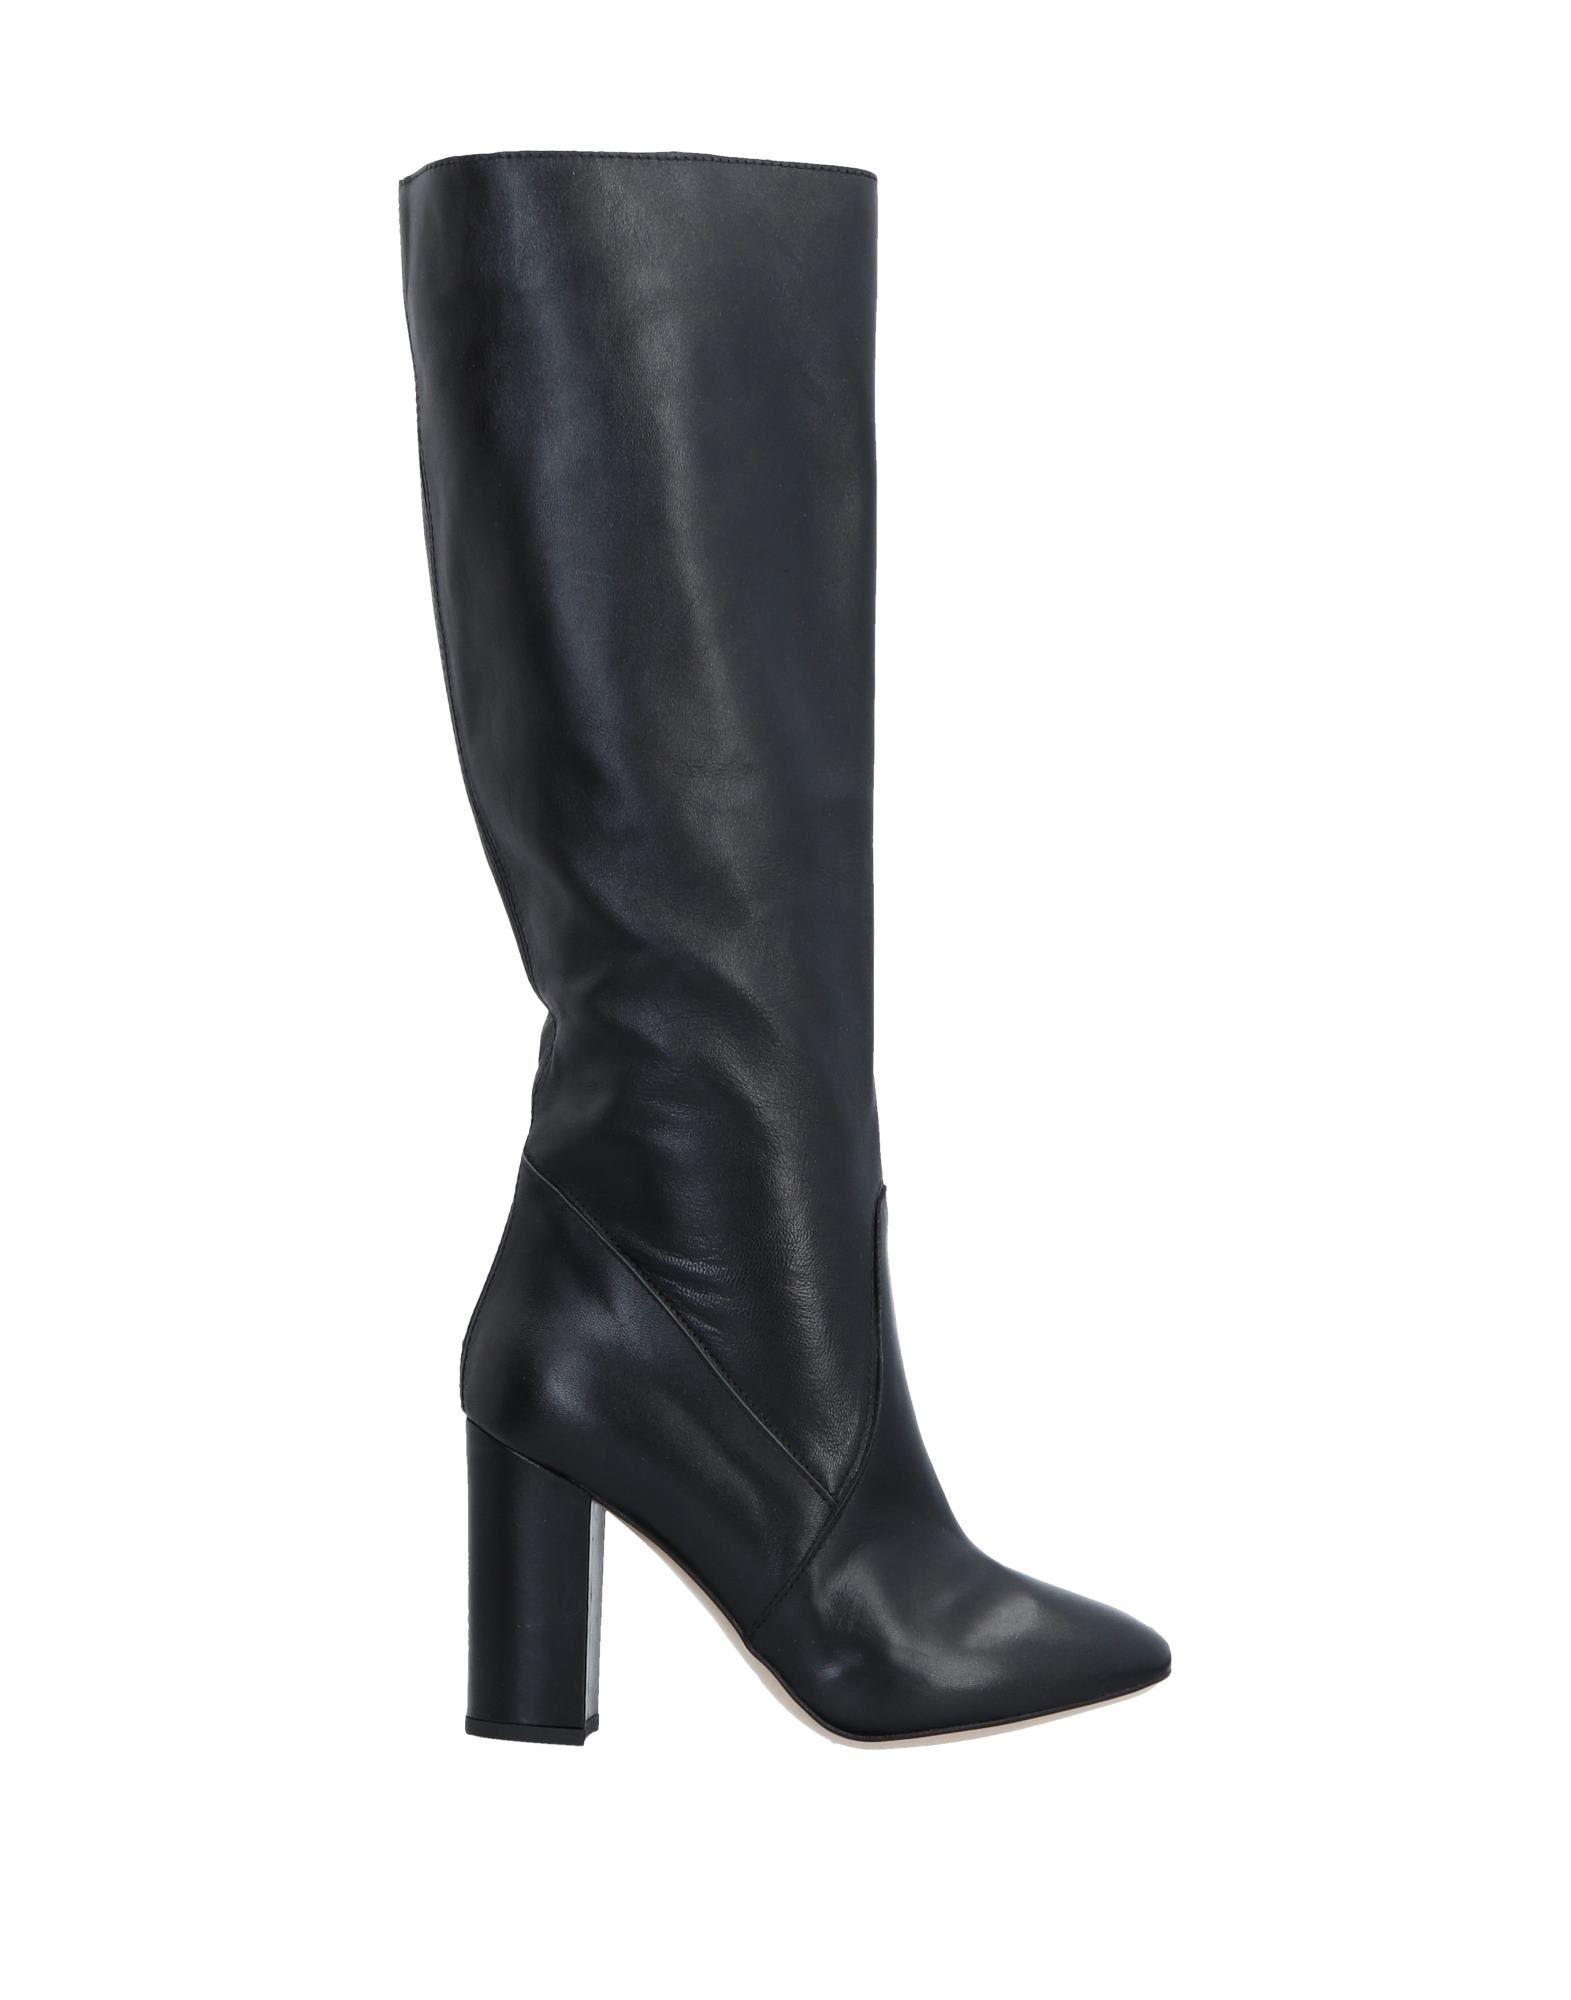 Stiefel Unlace damen - 11522585WB